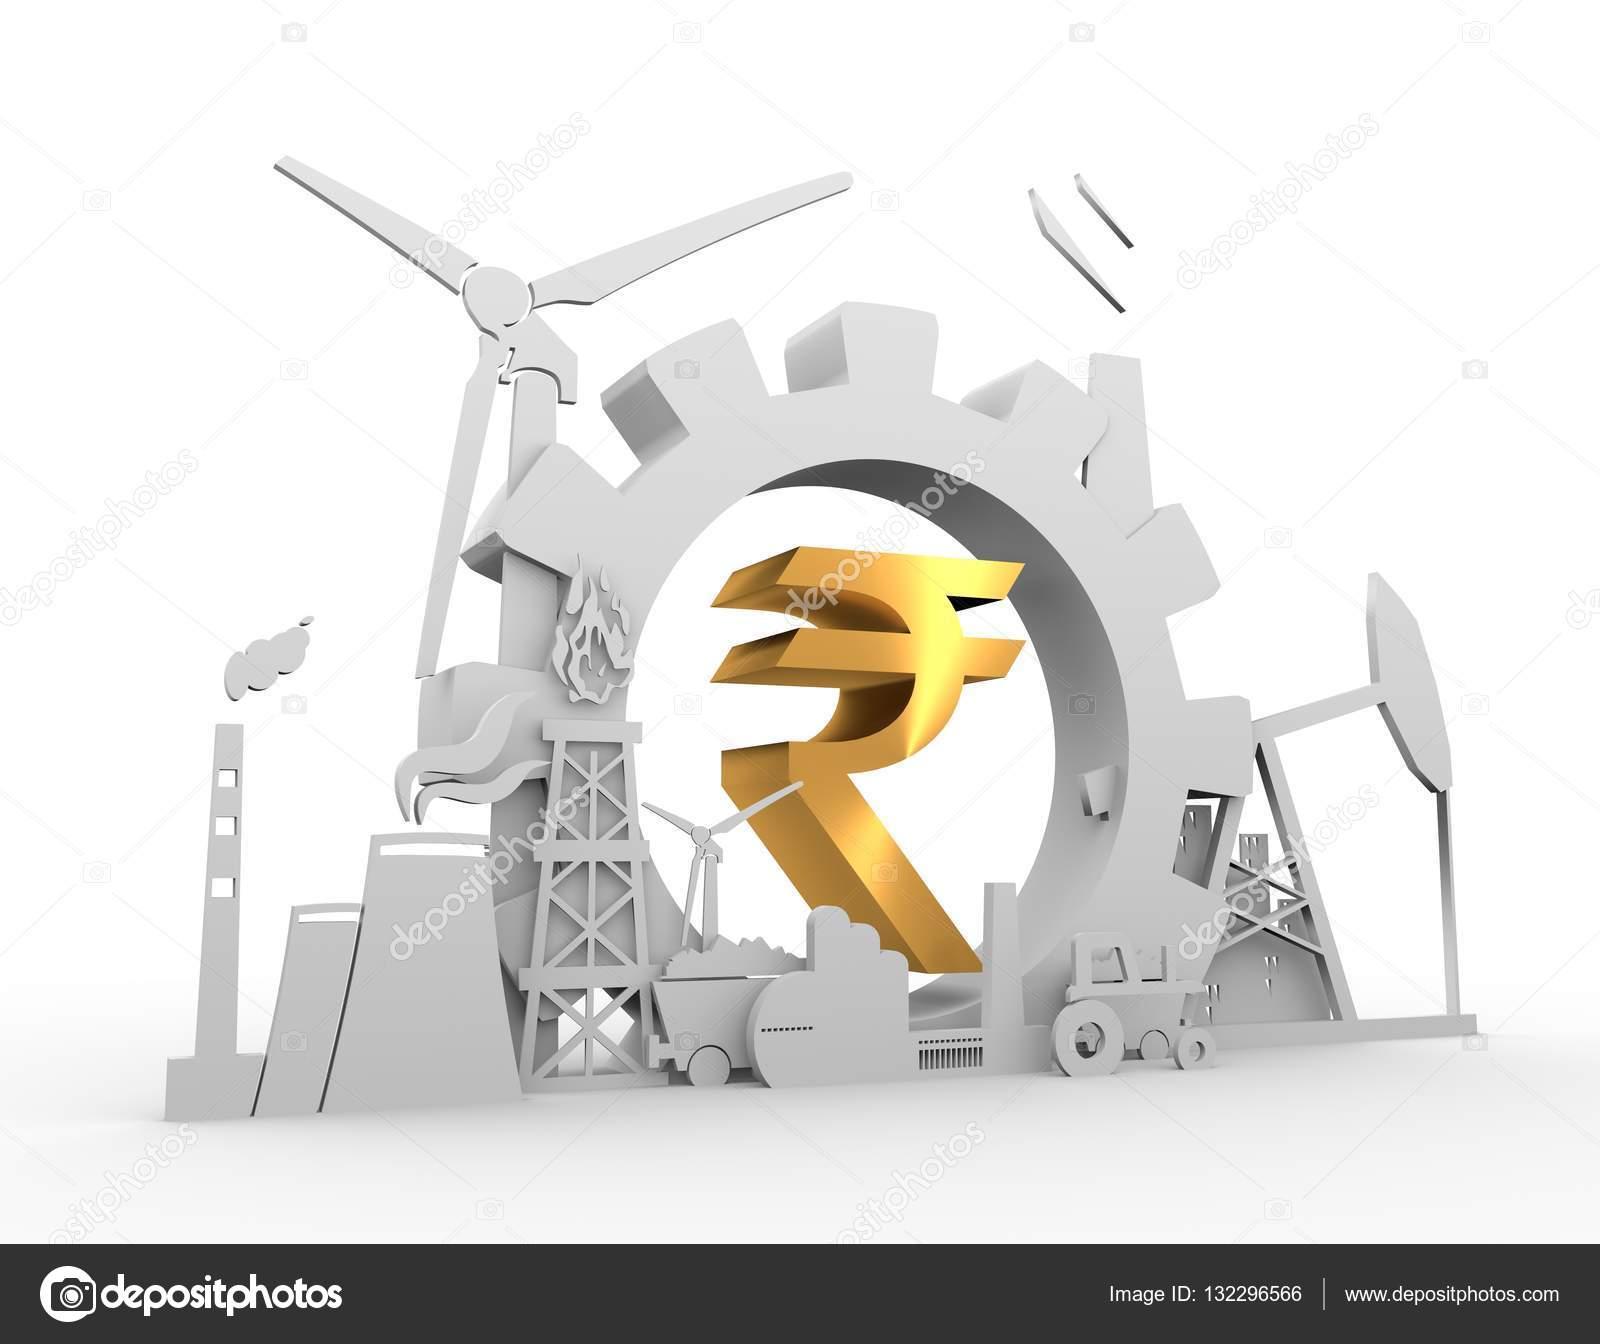 Golden indian rupee symbol stock photo jegasra 132296566 golden indian rupee symbol stock photo biocorpaavc Choice Image